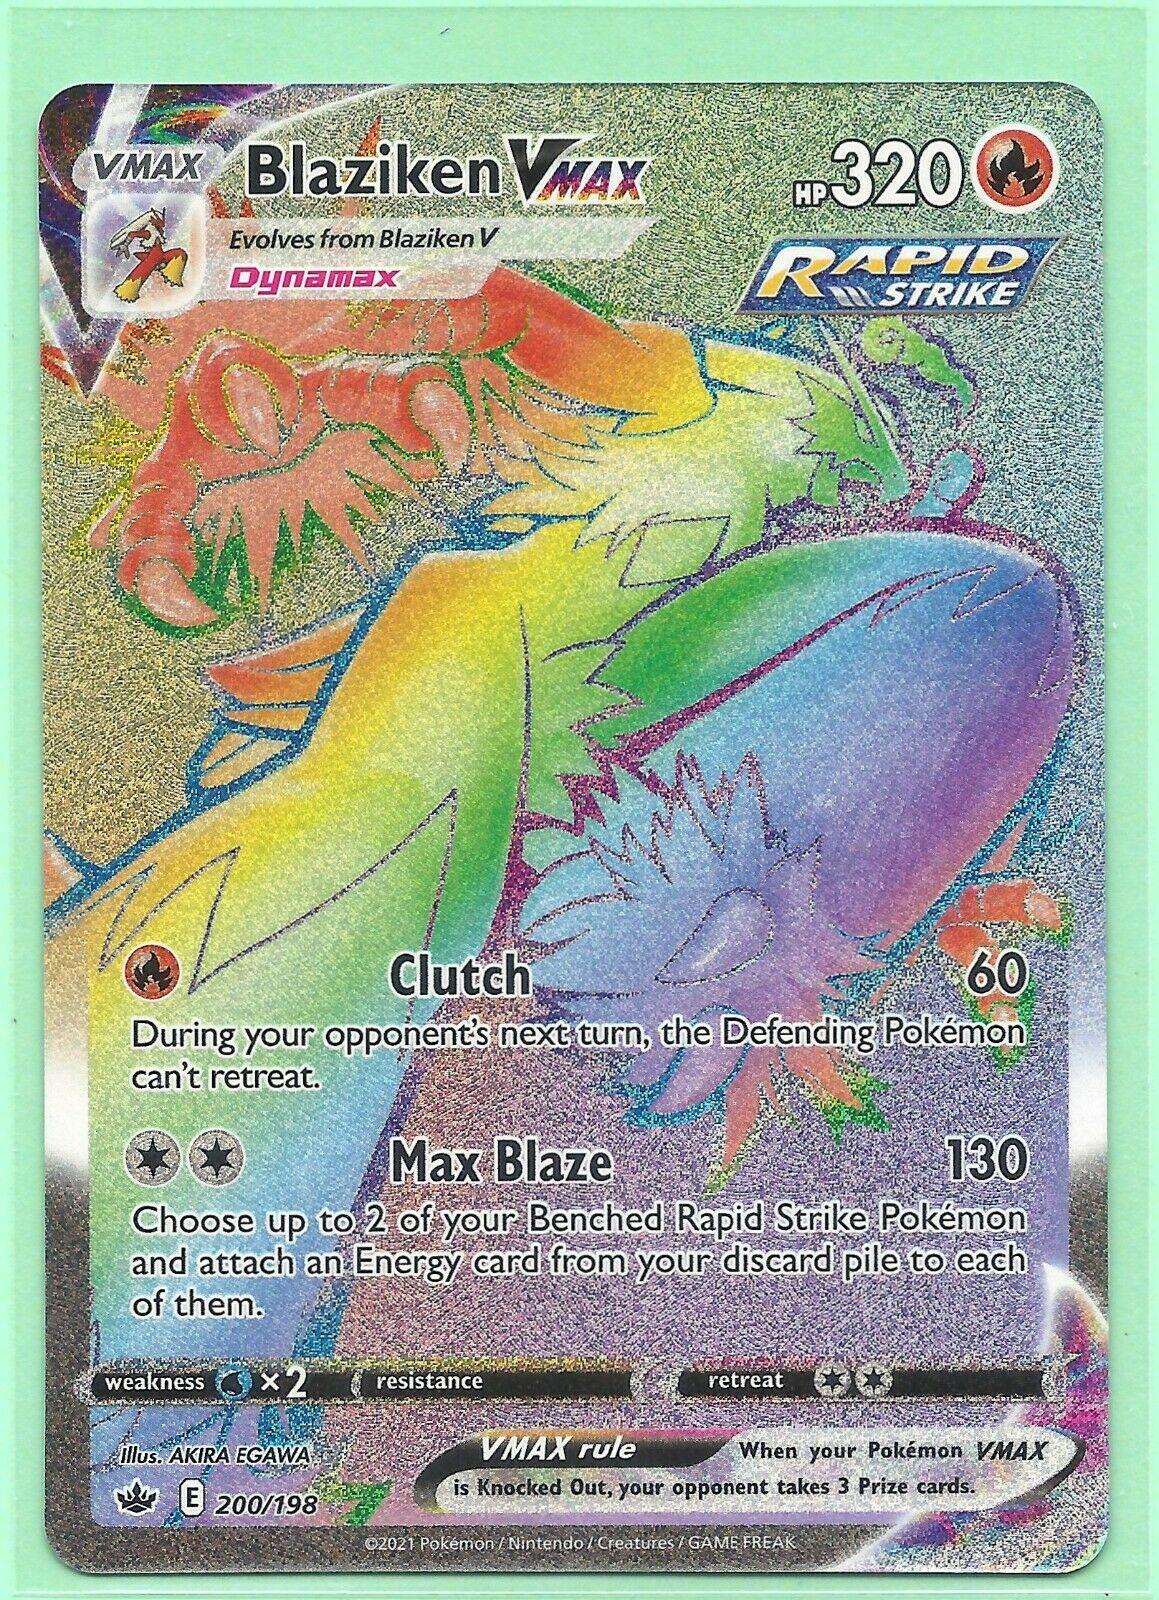 BLAZIKEN VMAX 200/198-CHILLING REIGN POKEMON CARD RAINBOW SECRET RARE-MINT-FRESH